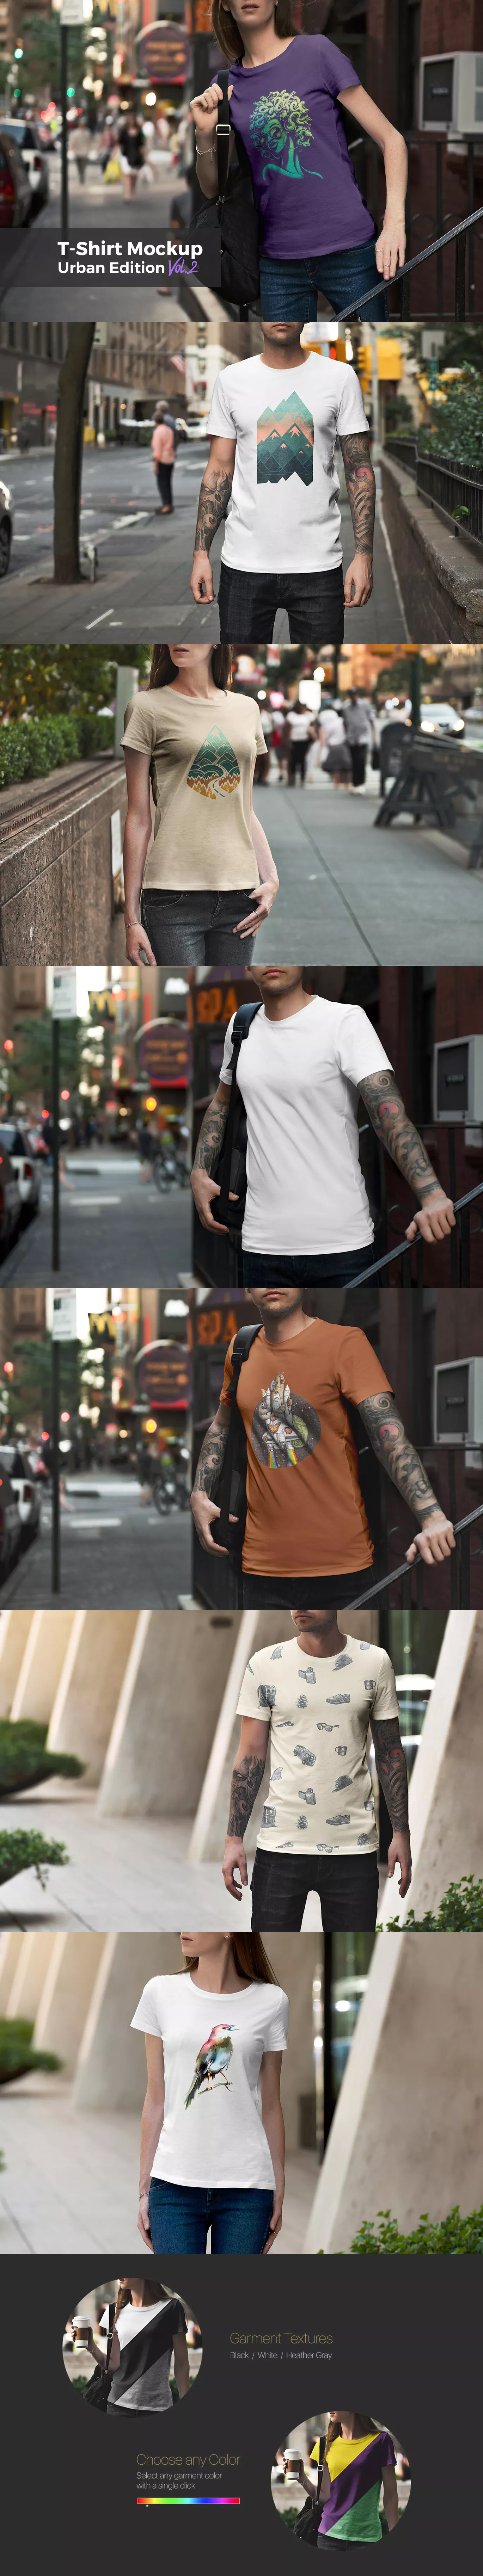 Download T Shirt Mockup Urban Edition Vol 2 By Genetic96 On Envato Elements Shirt Mockup Tshirt Mockup Mockup